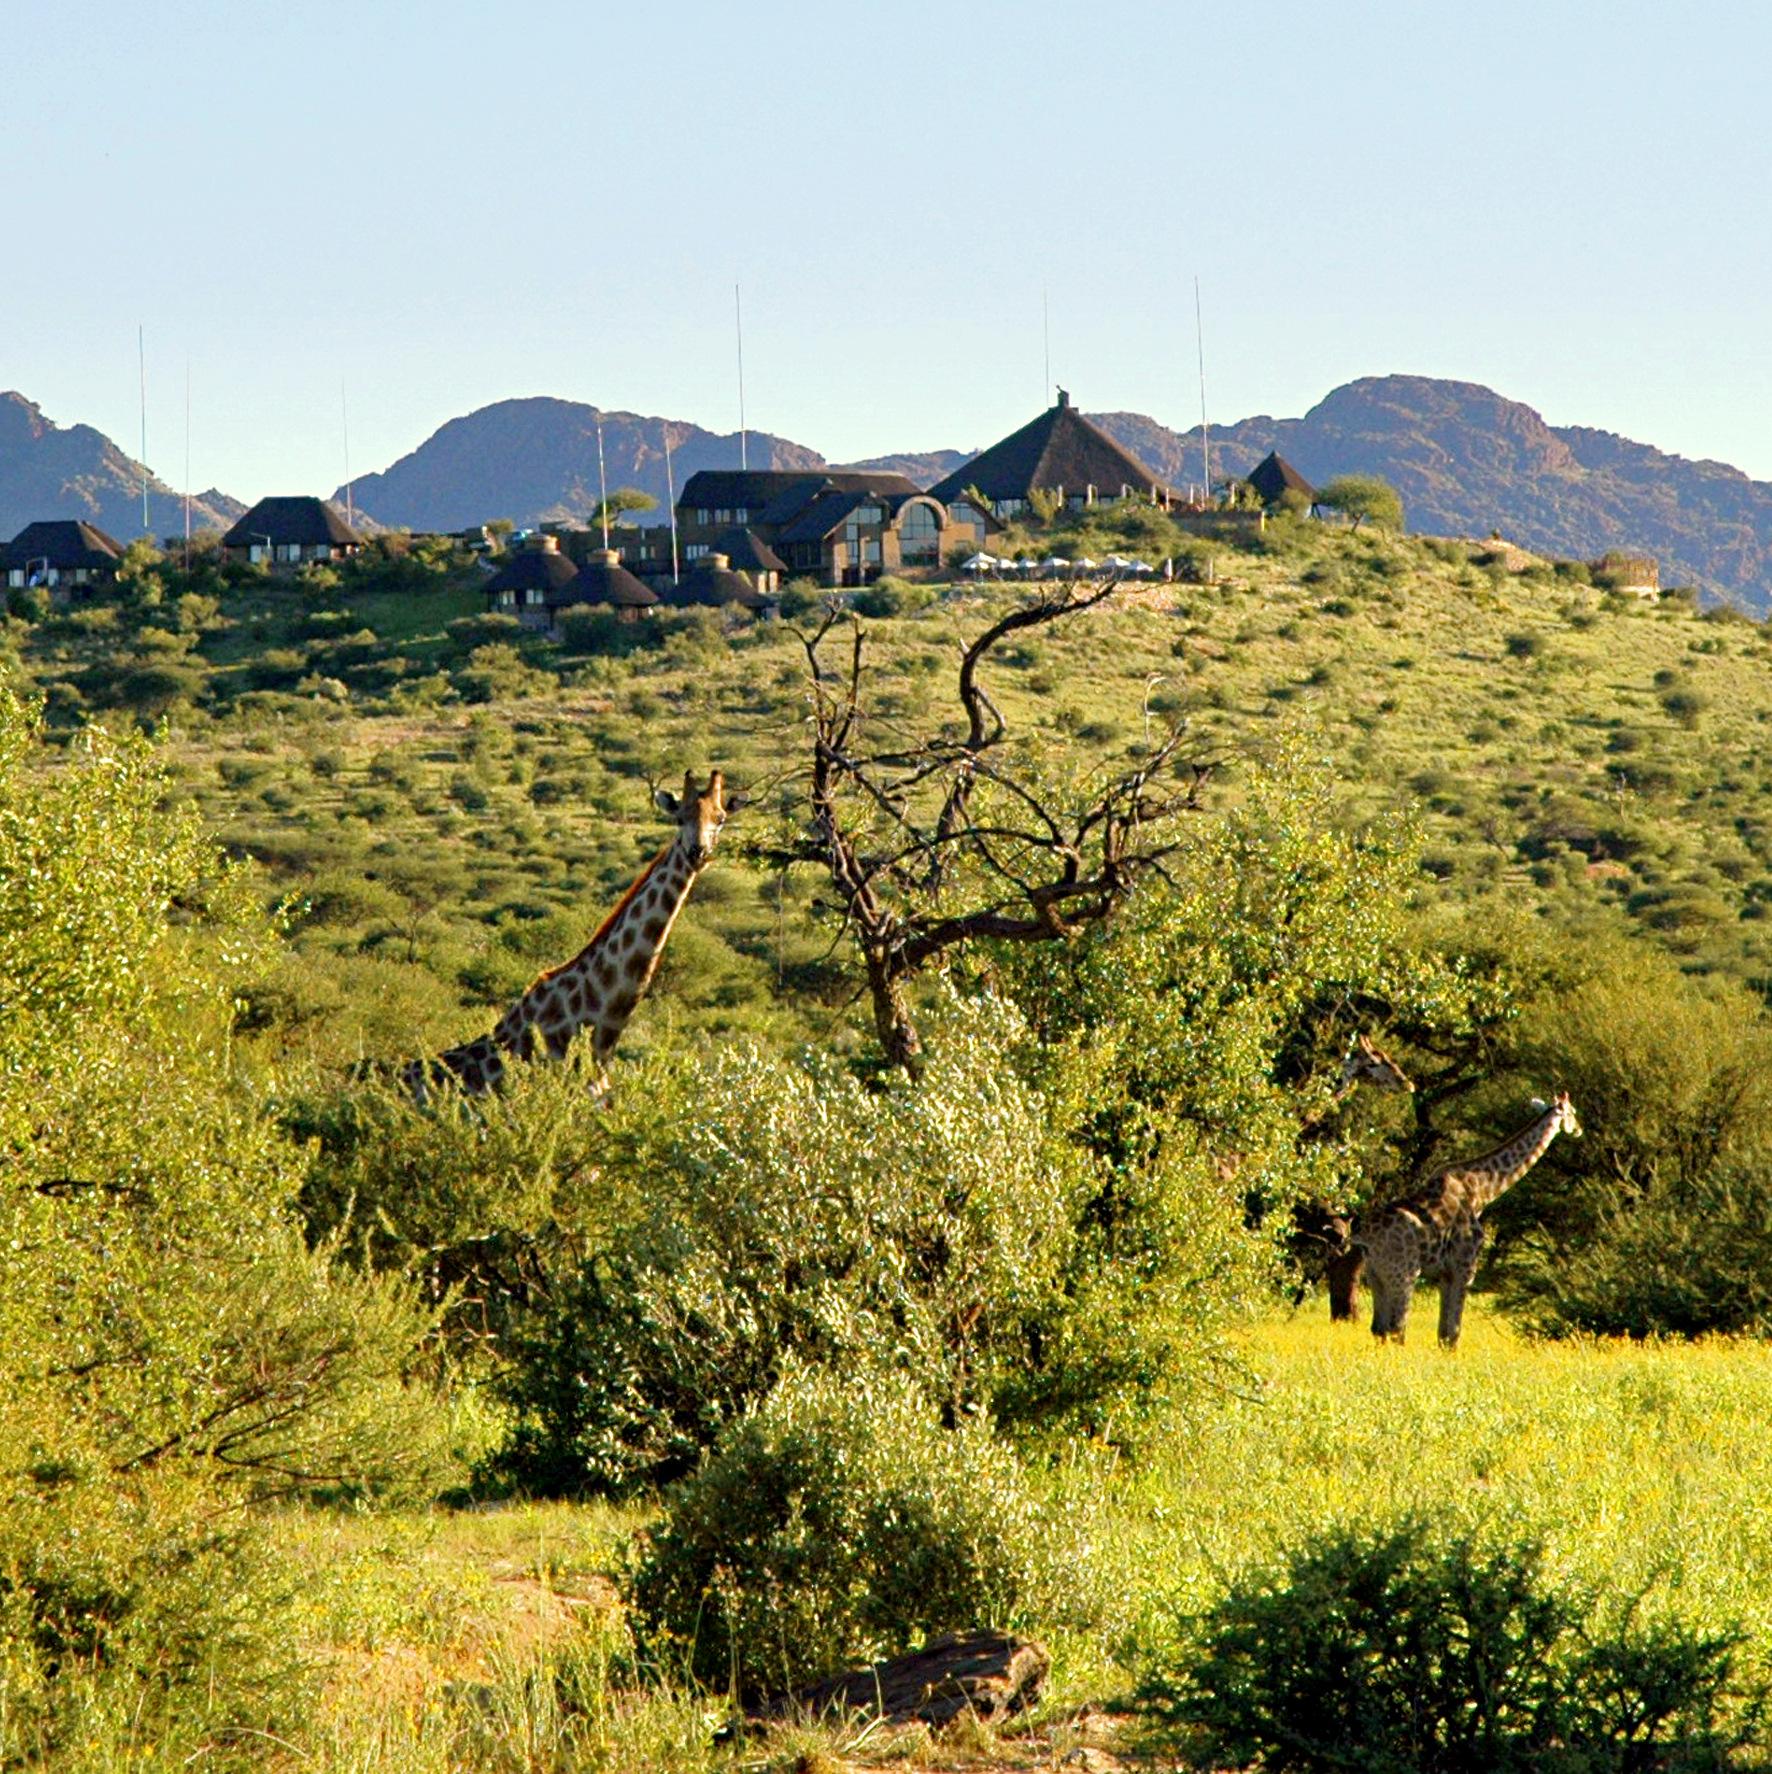 Namibia - 1552 - Gocheganas - Exterior